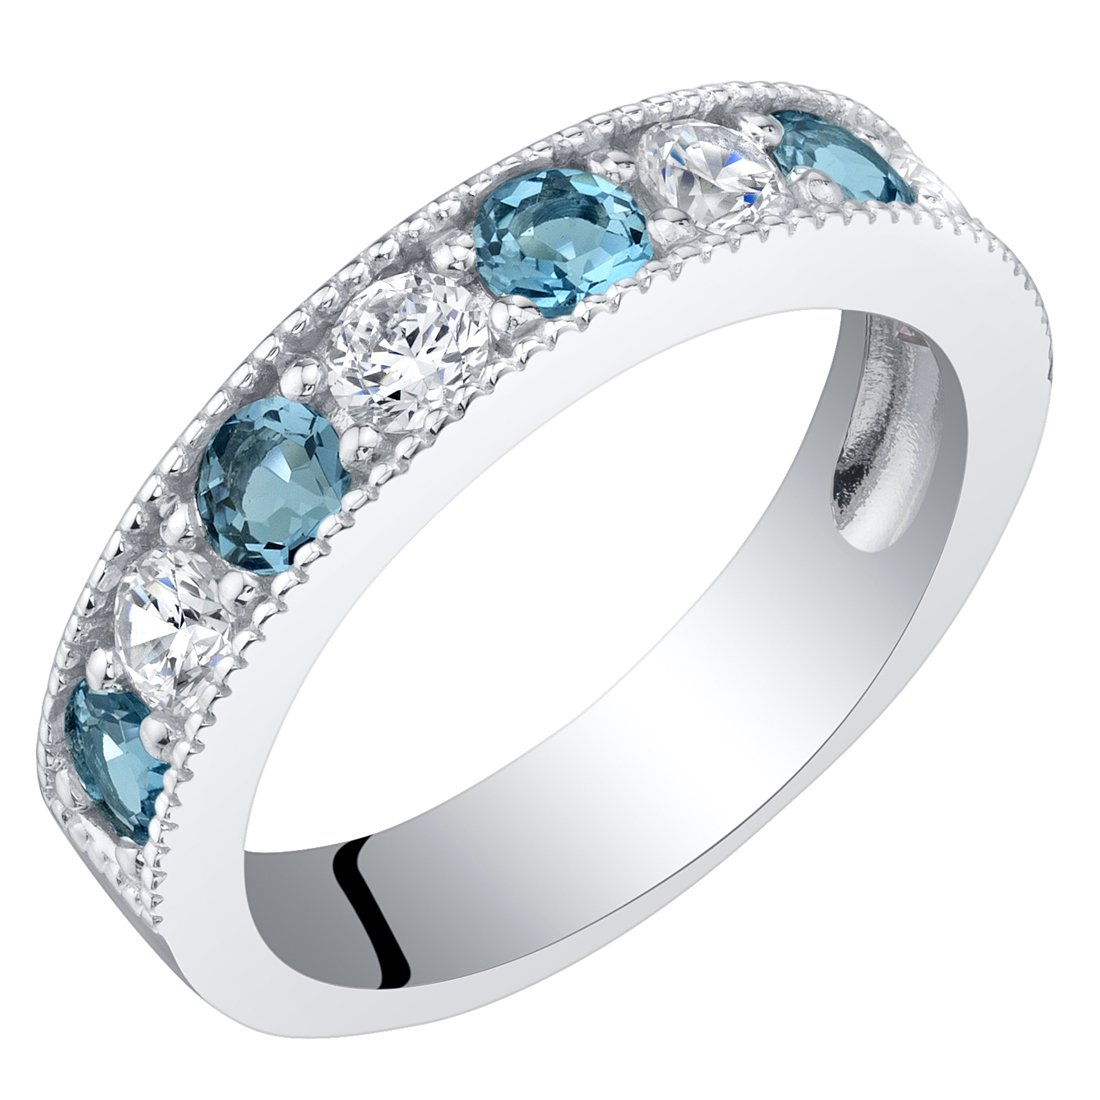 Sterling Silver London Blue Topaz Milgrain Half Eternity Ring Band Size 7